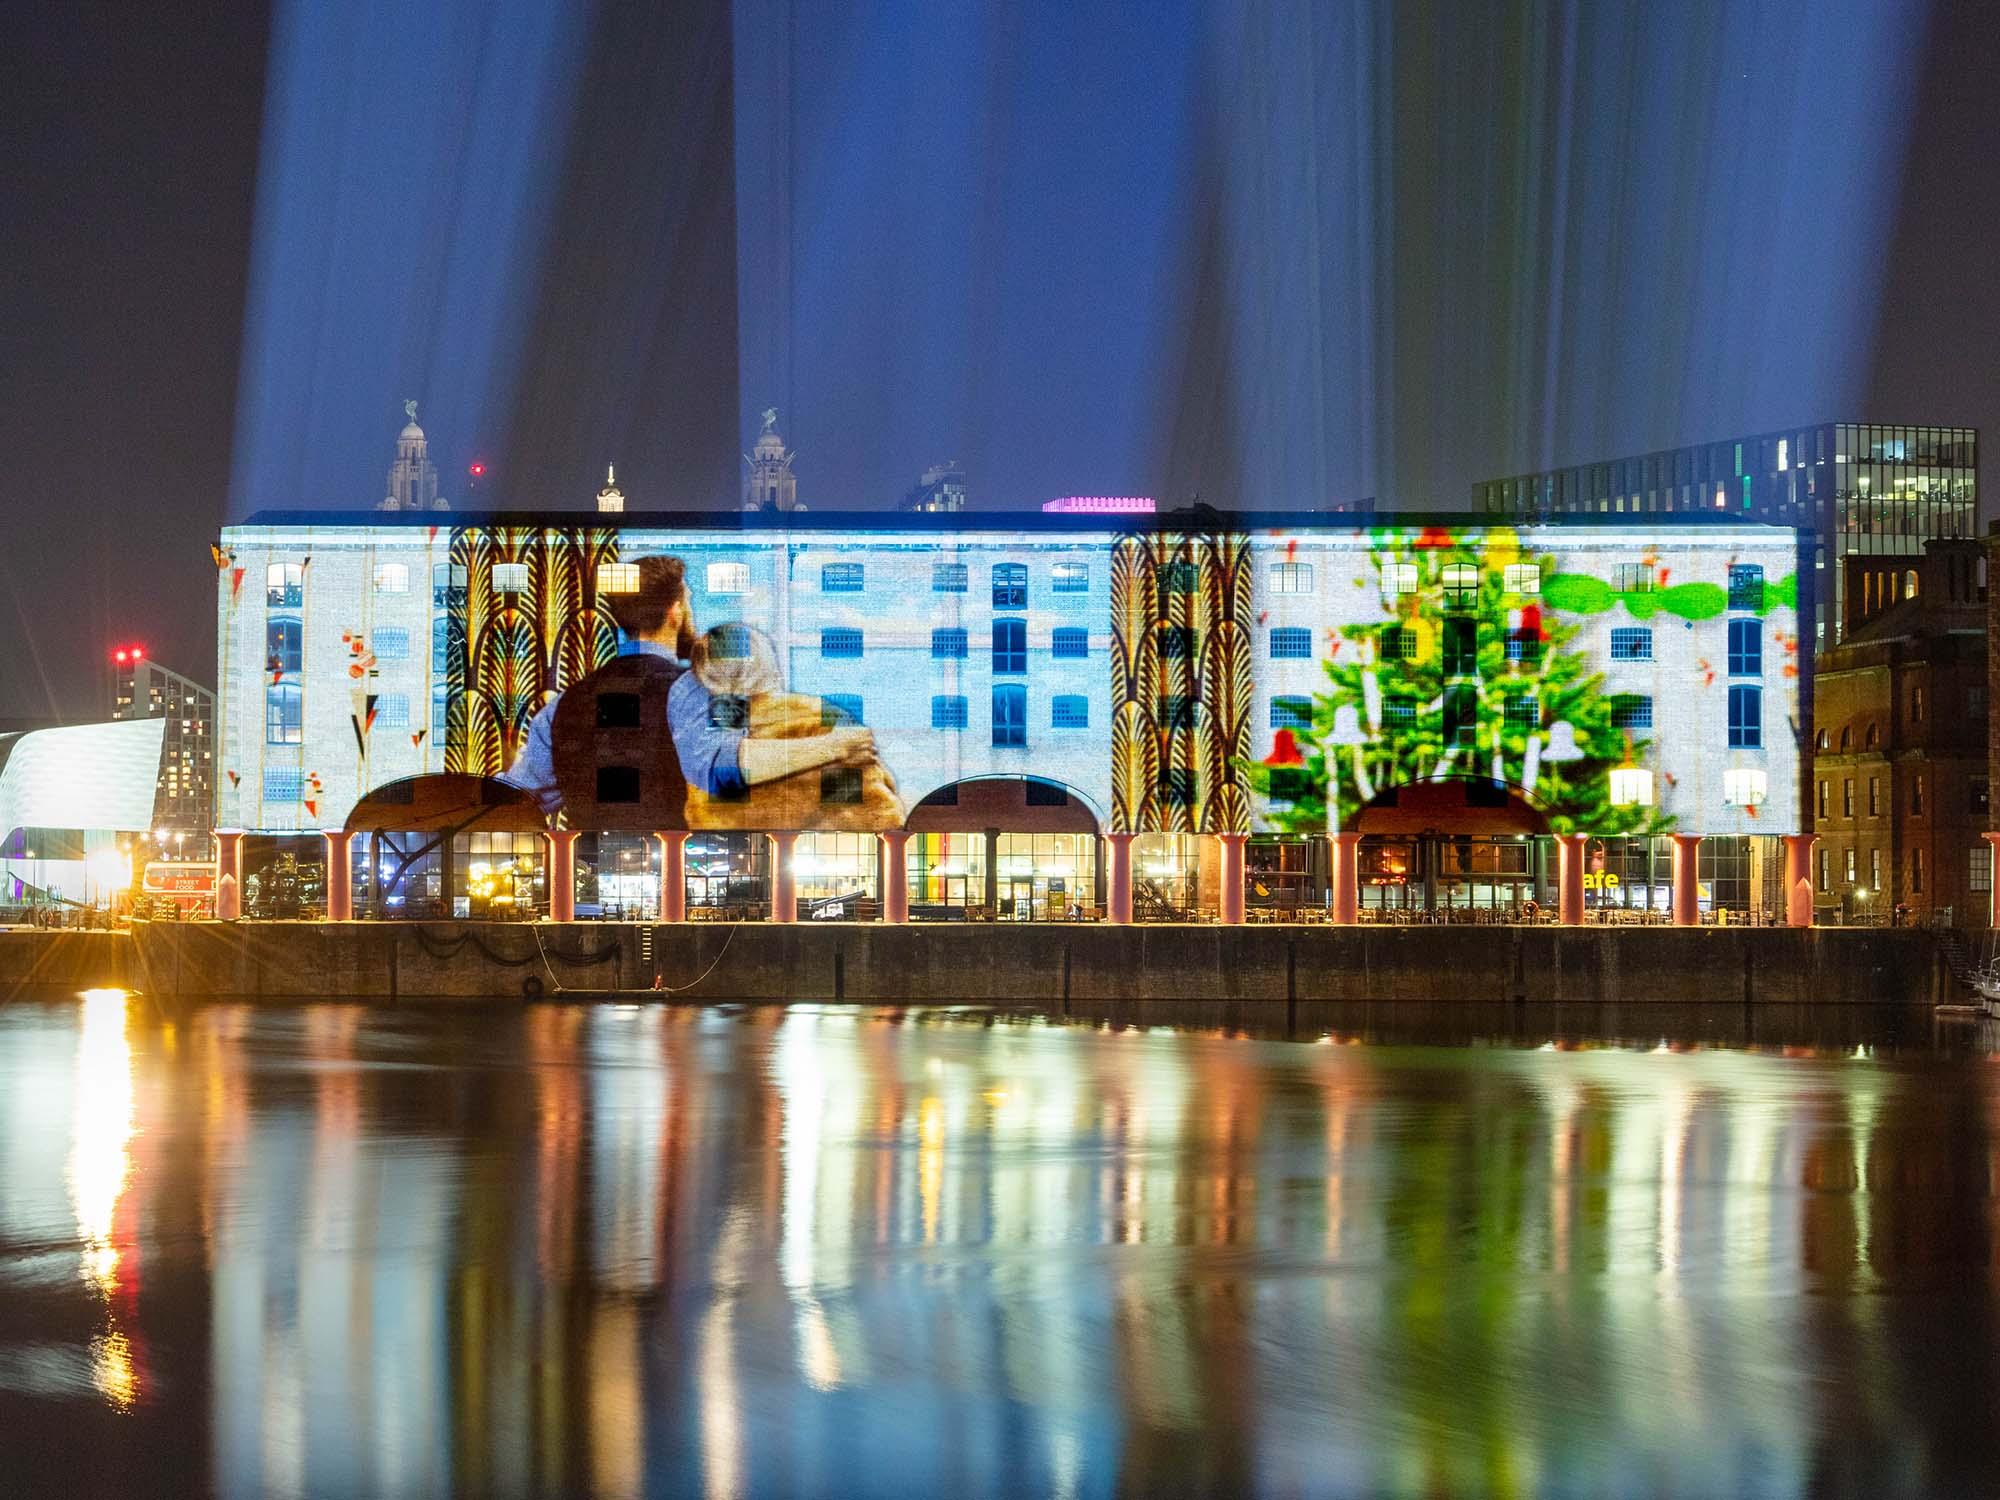 Liverpool Albert Dock Christmas projections show